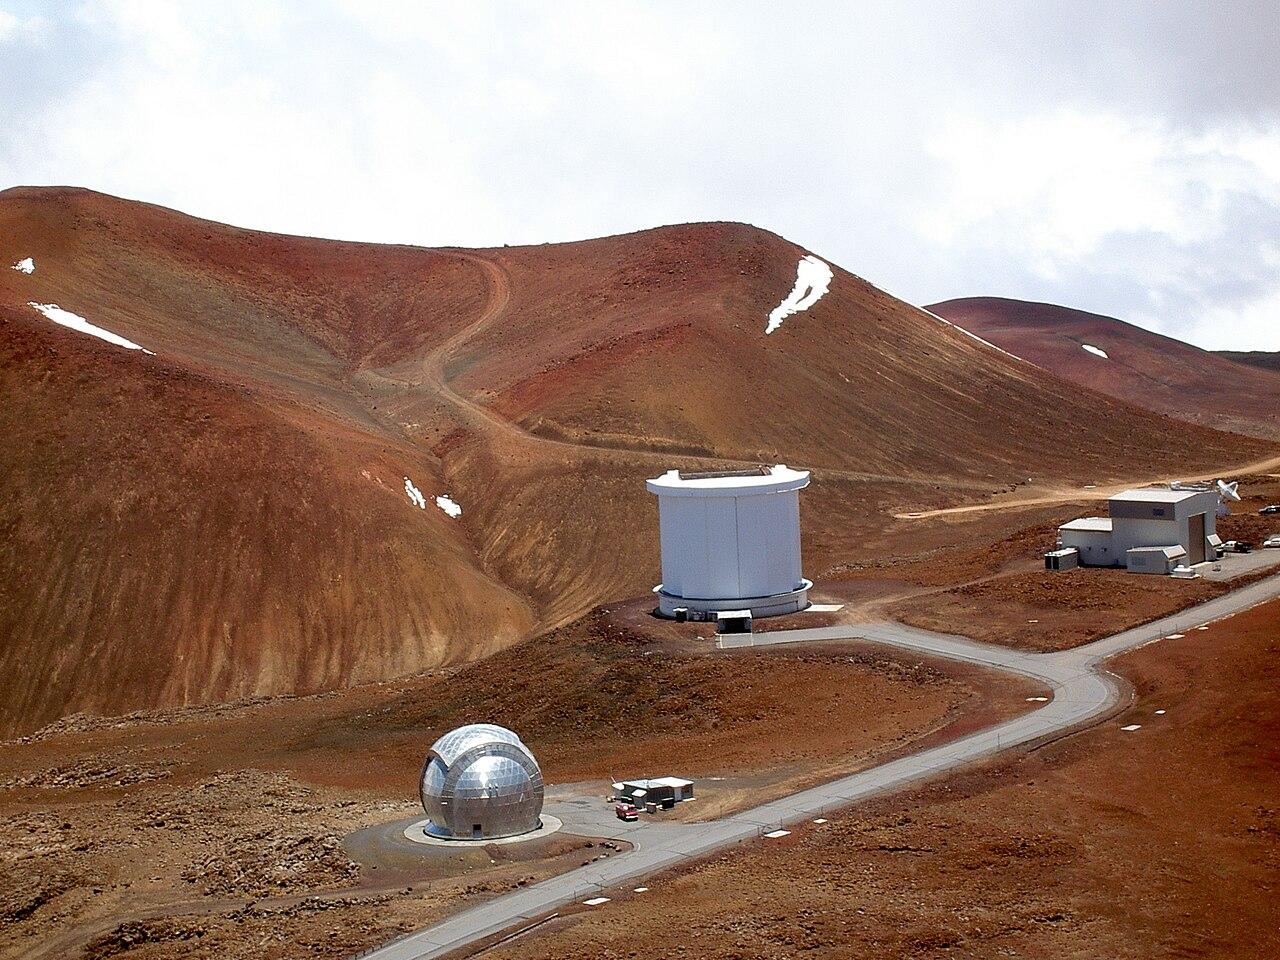 JCMT on Mauna Kea, vida en venus